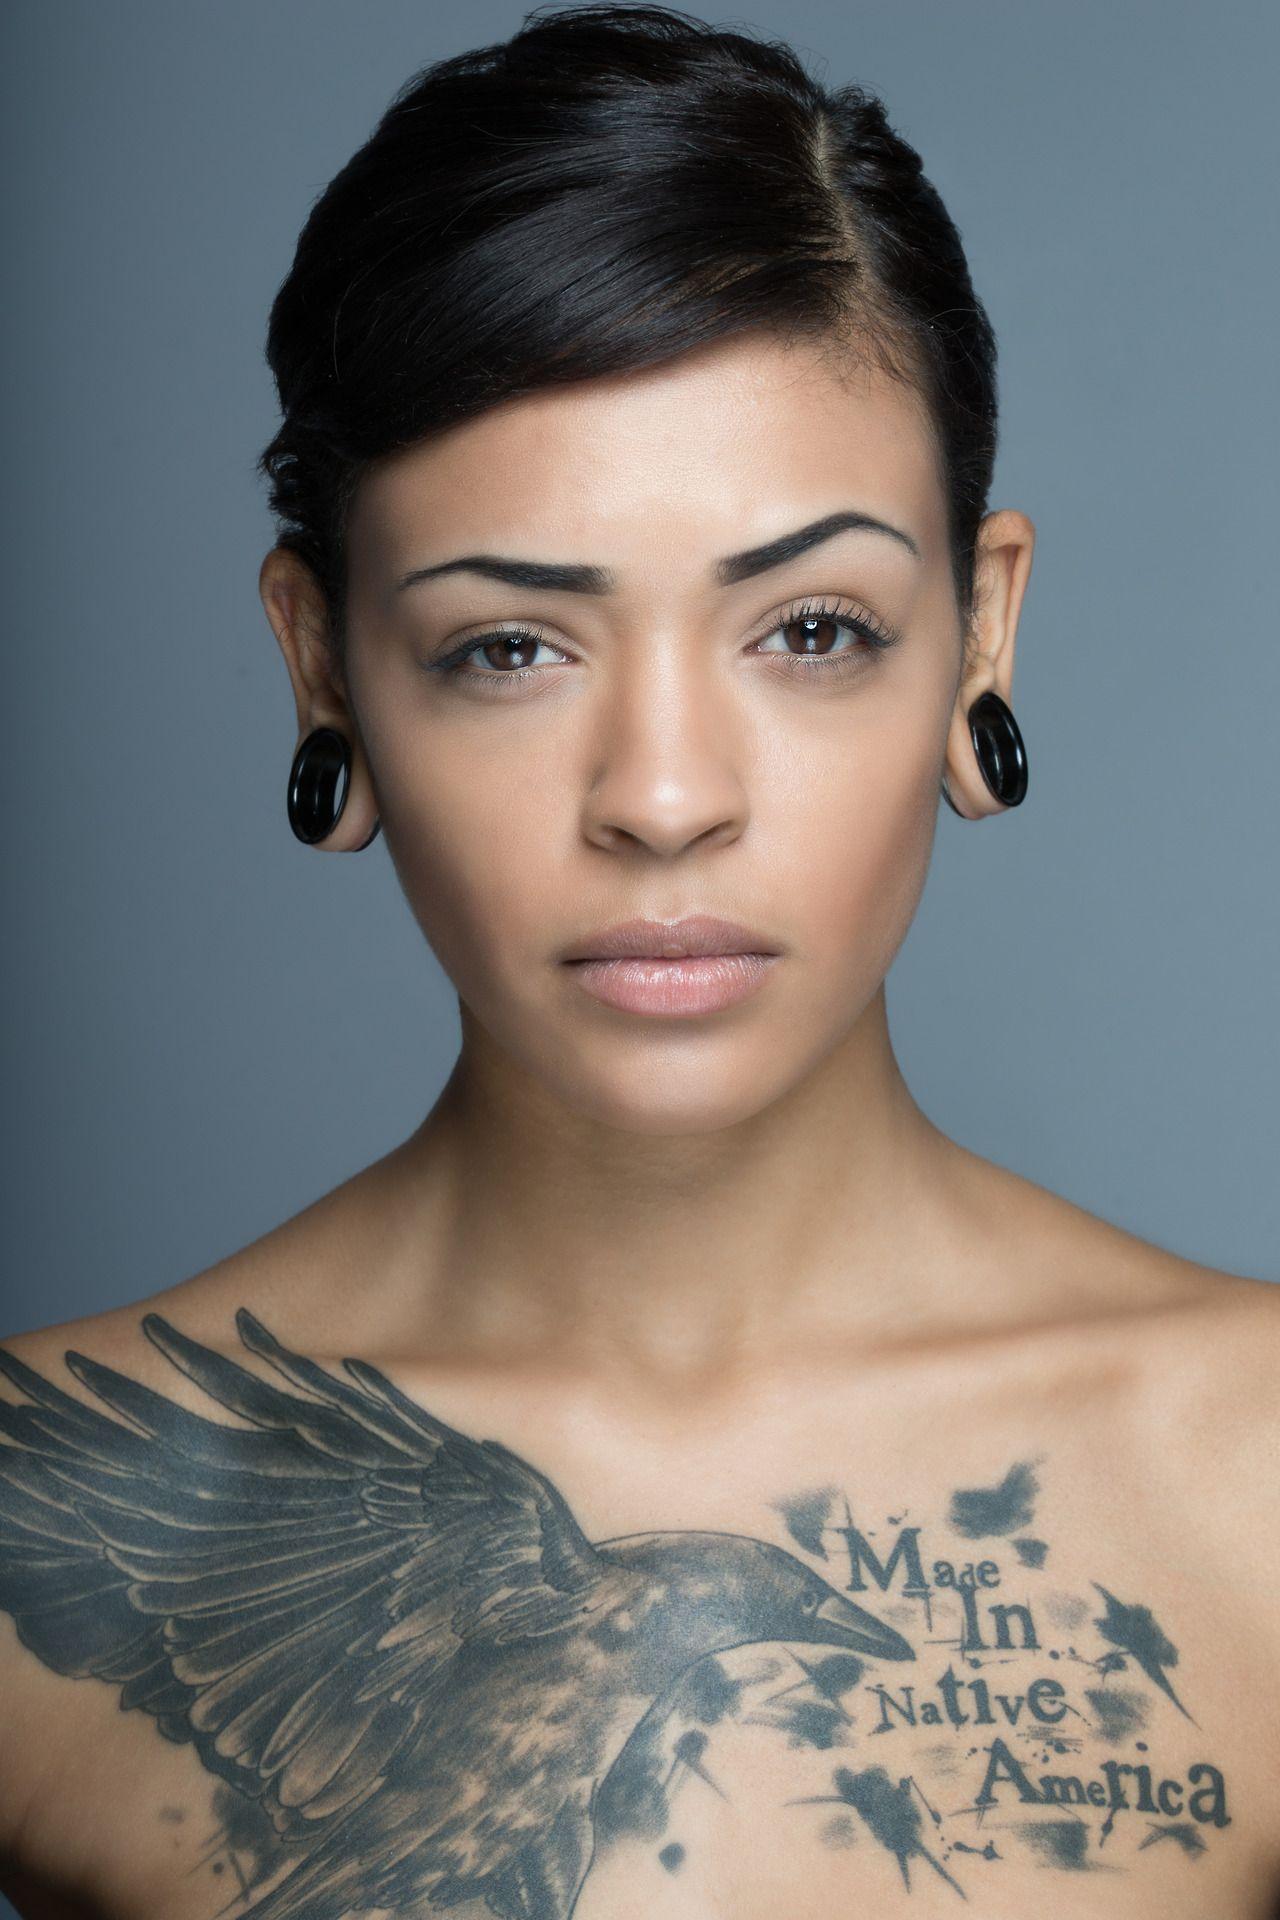 Chest tattoos for women image by Tara Yamry on ⓈtąƄ Ṃe